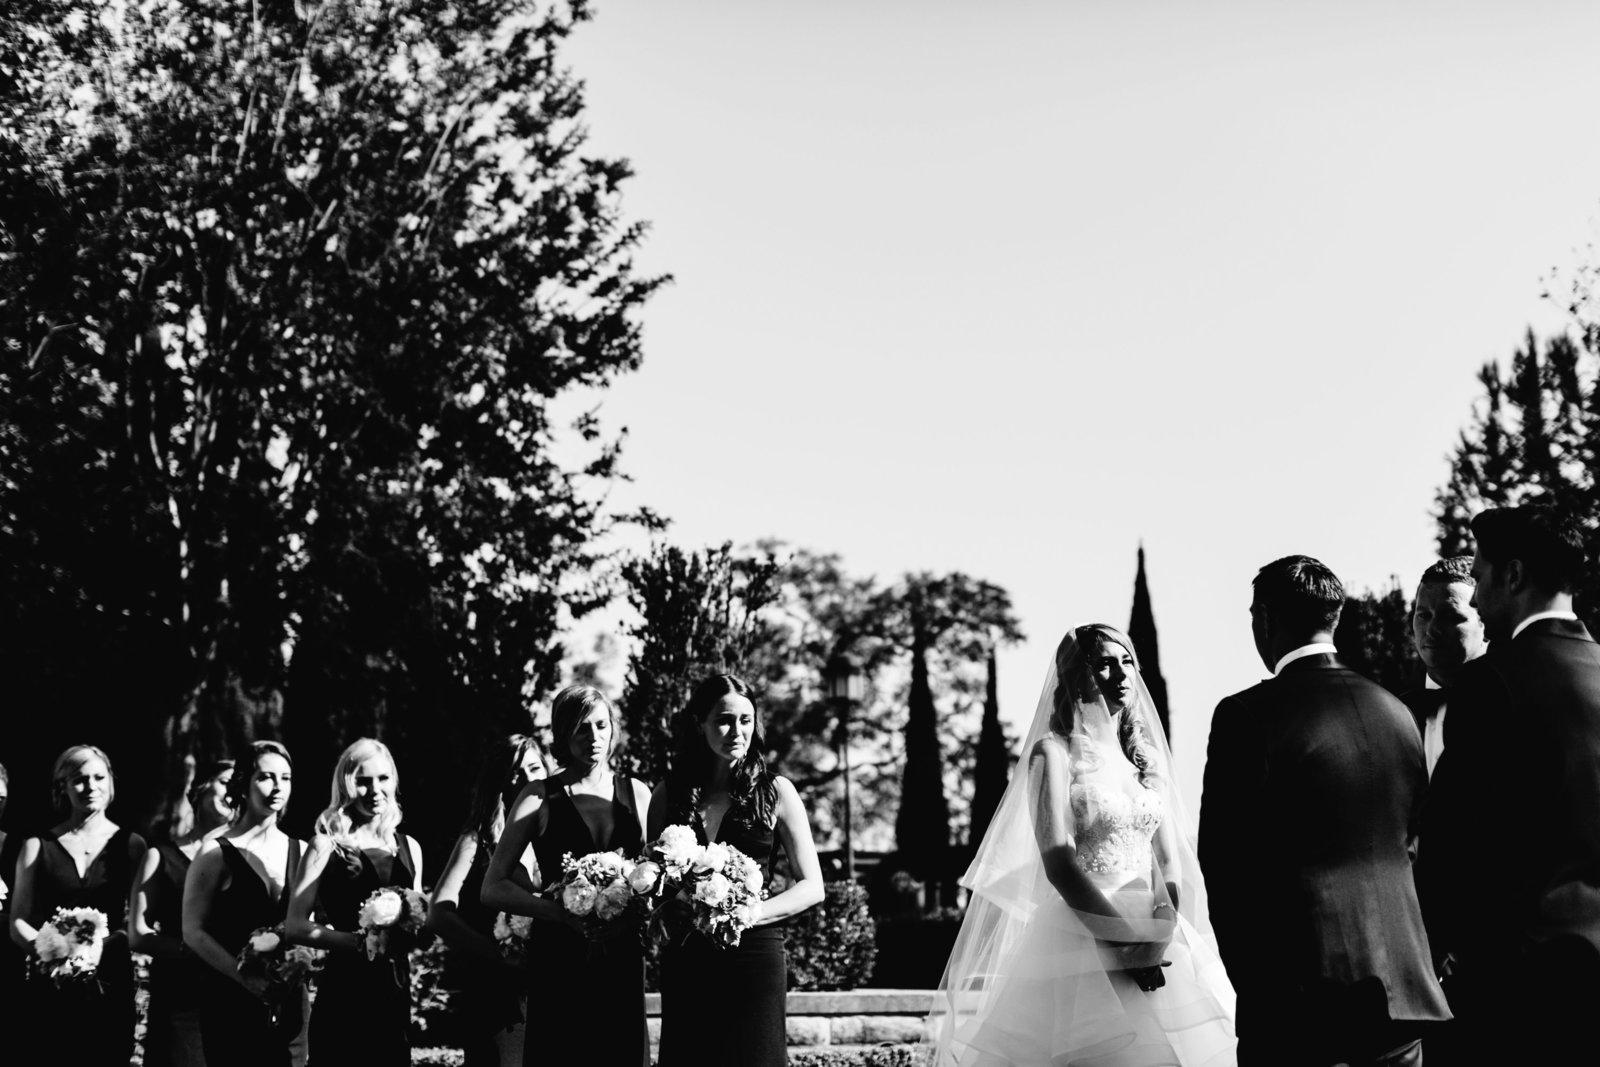 Wedding Photos-Jodee Debes Photography-158